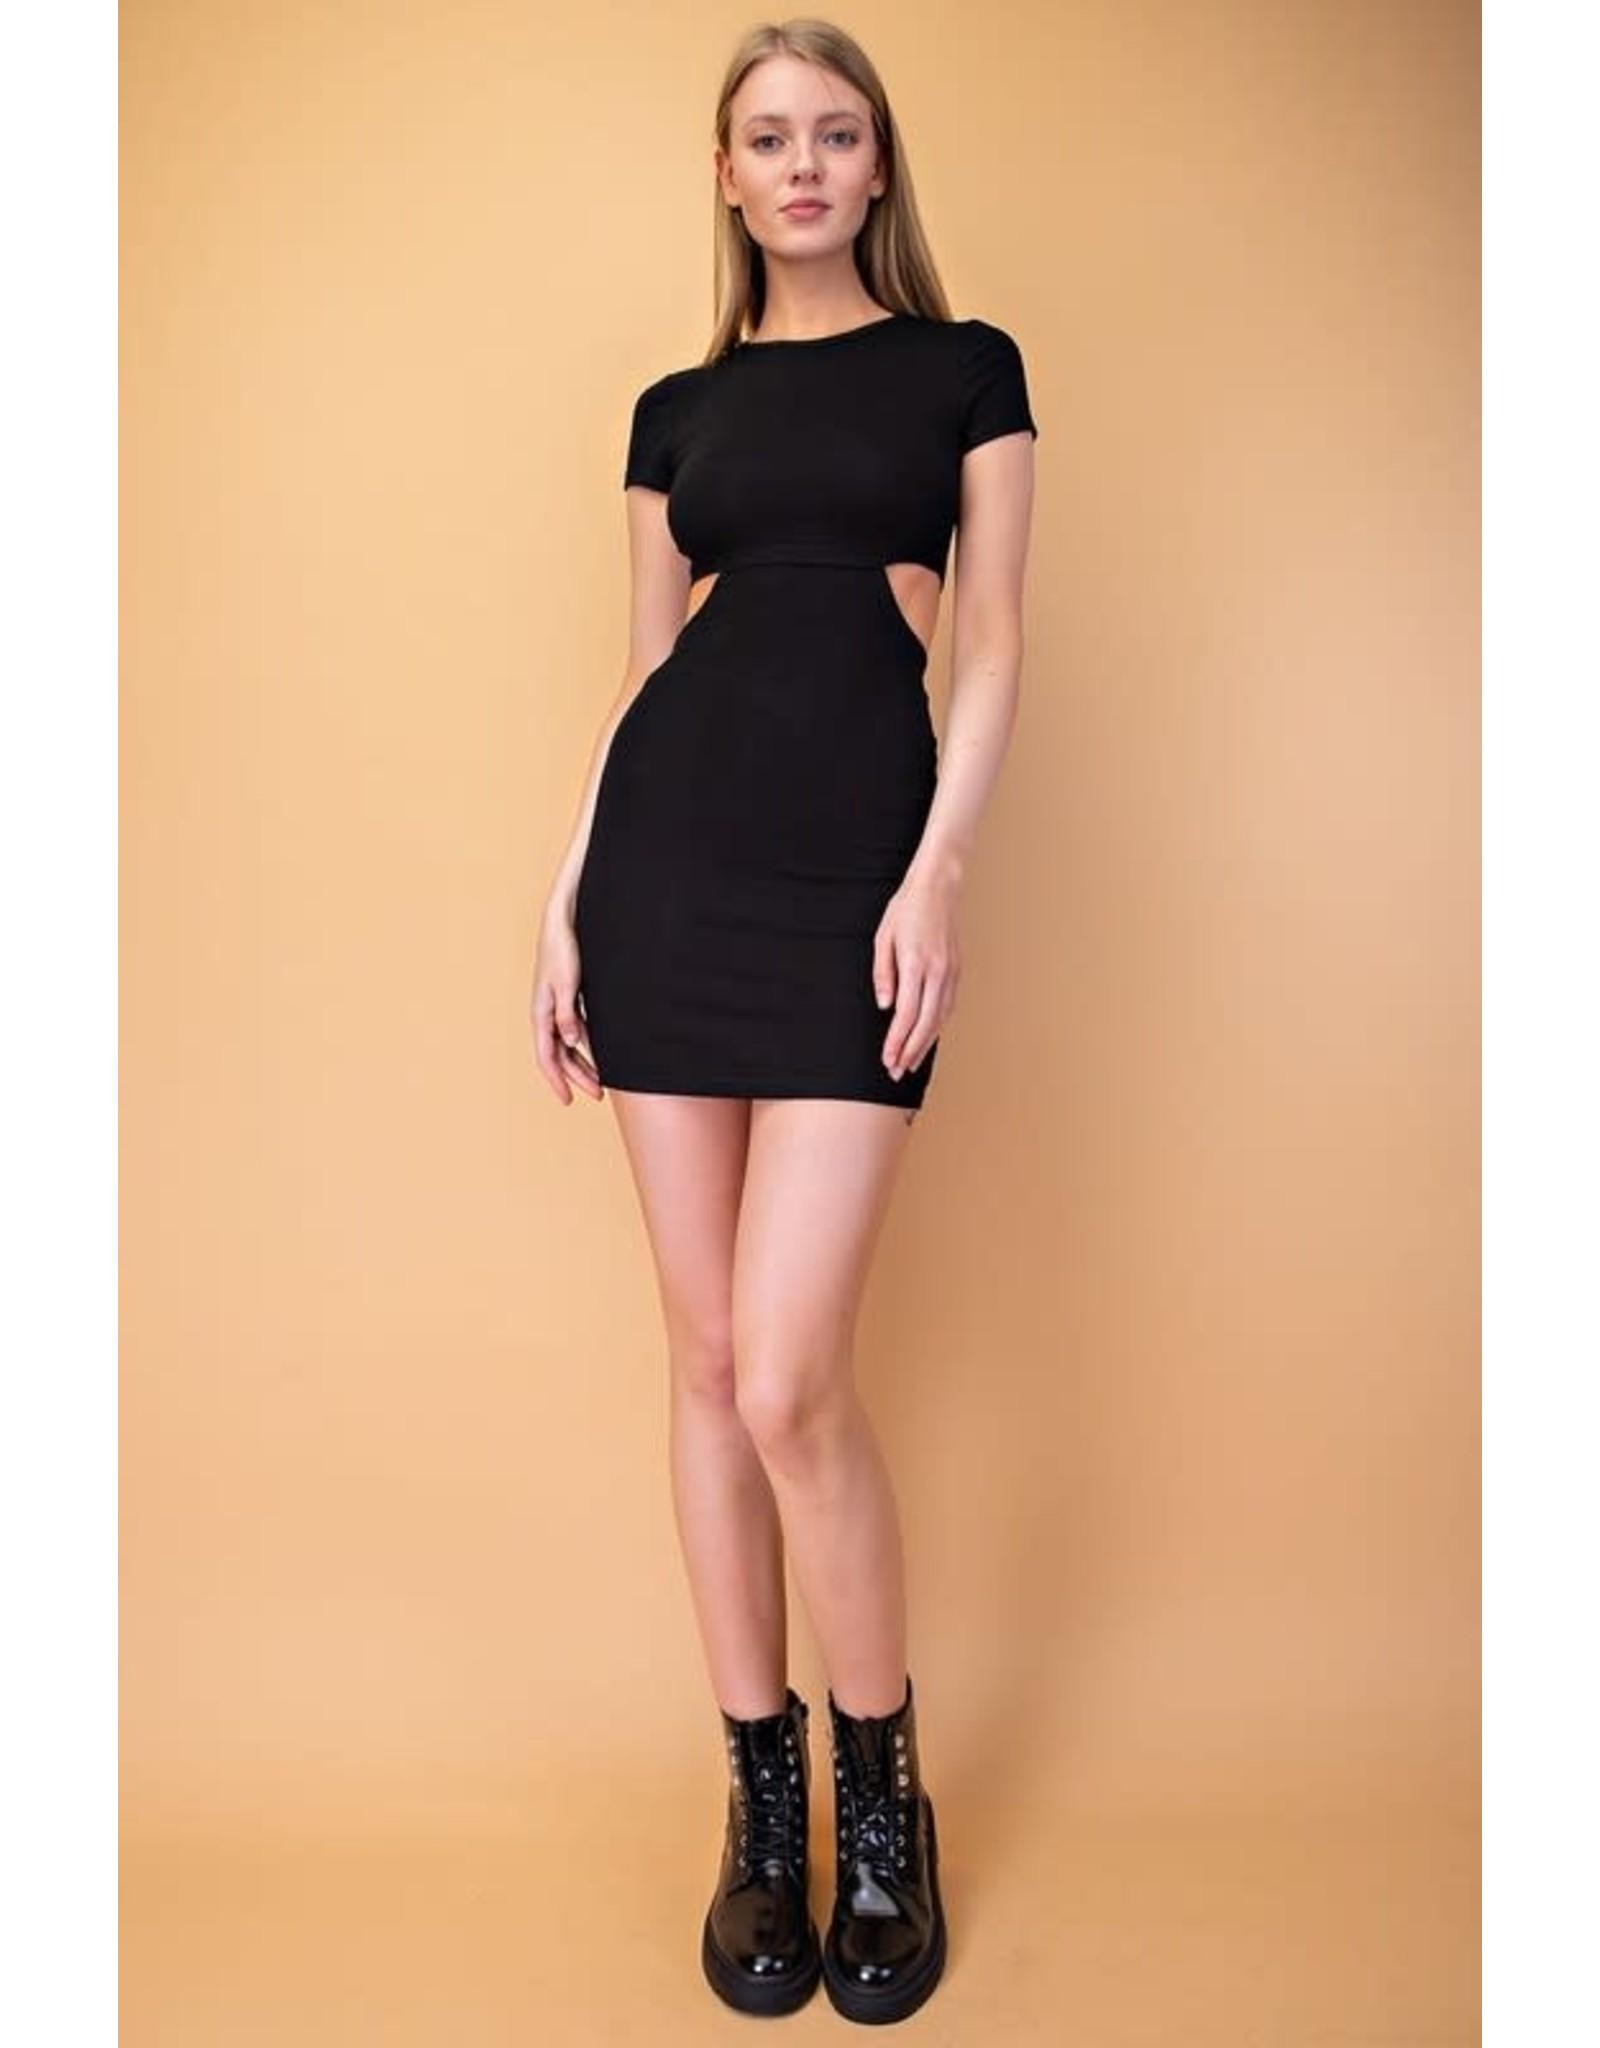 Sounds So Easy Dress